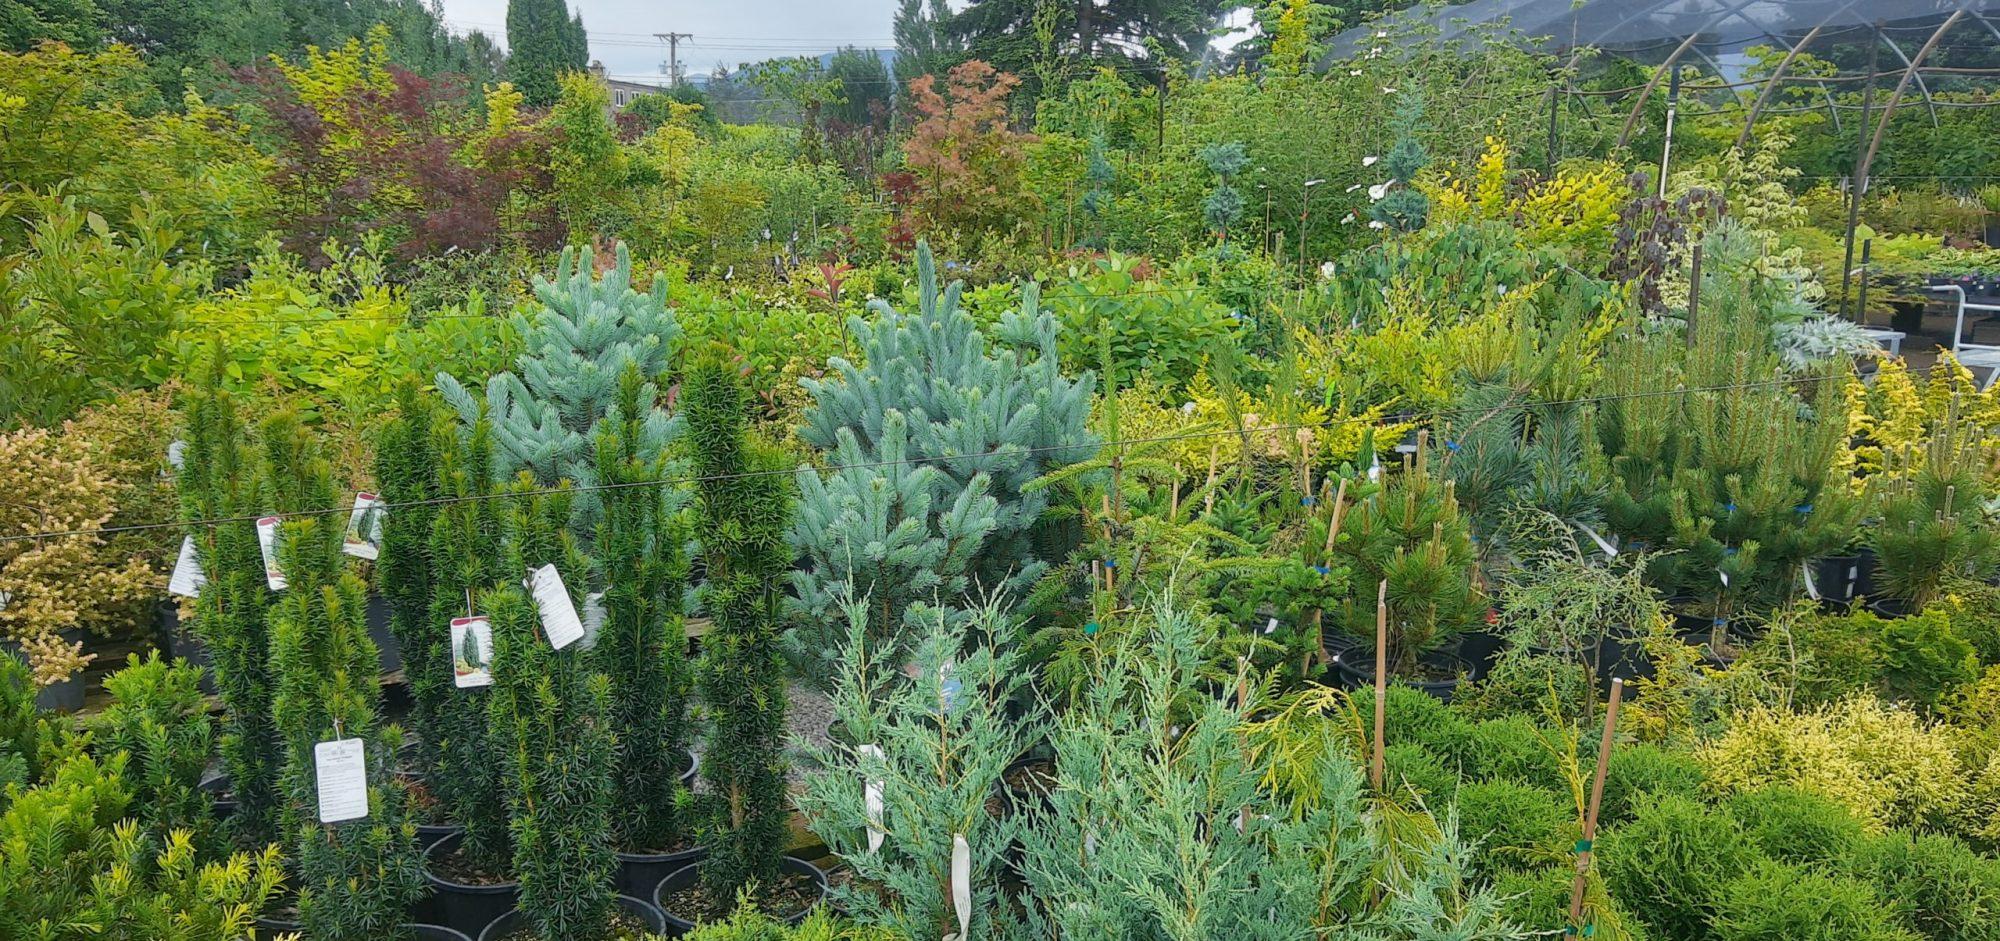 Colyn's Nursery & Garden Centre